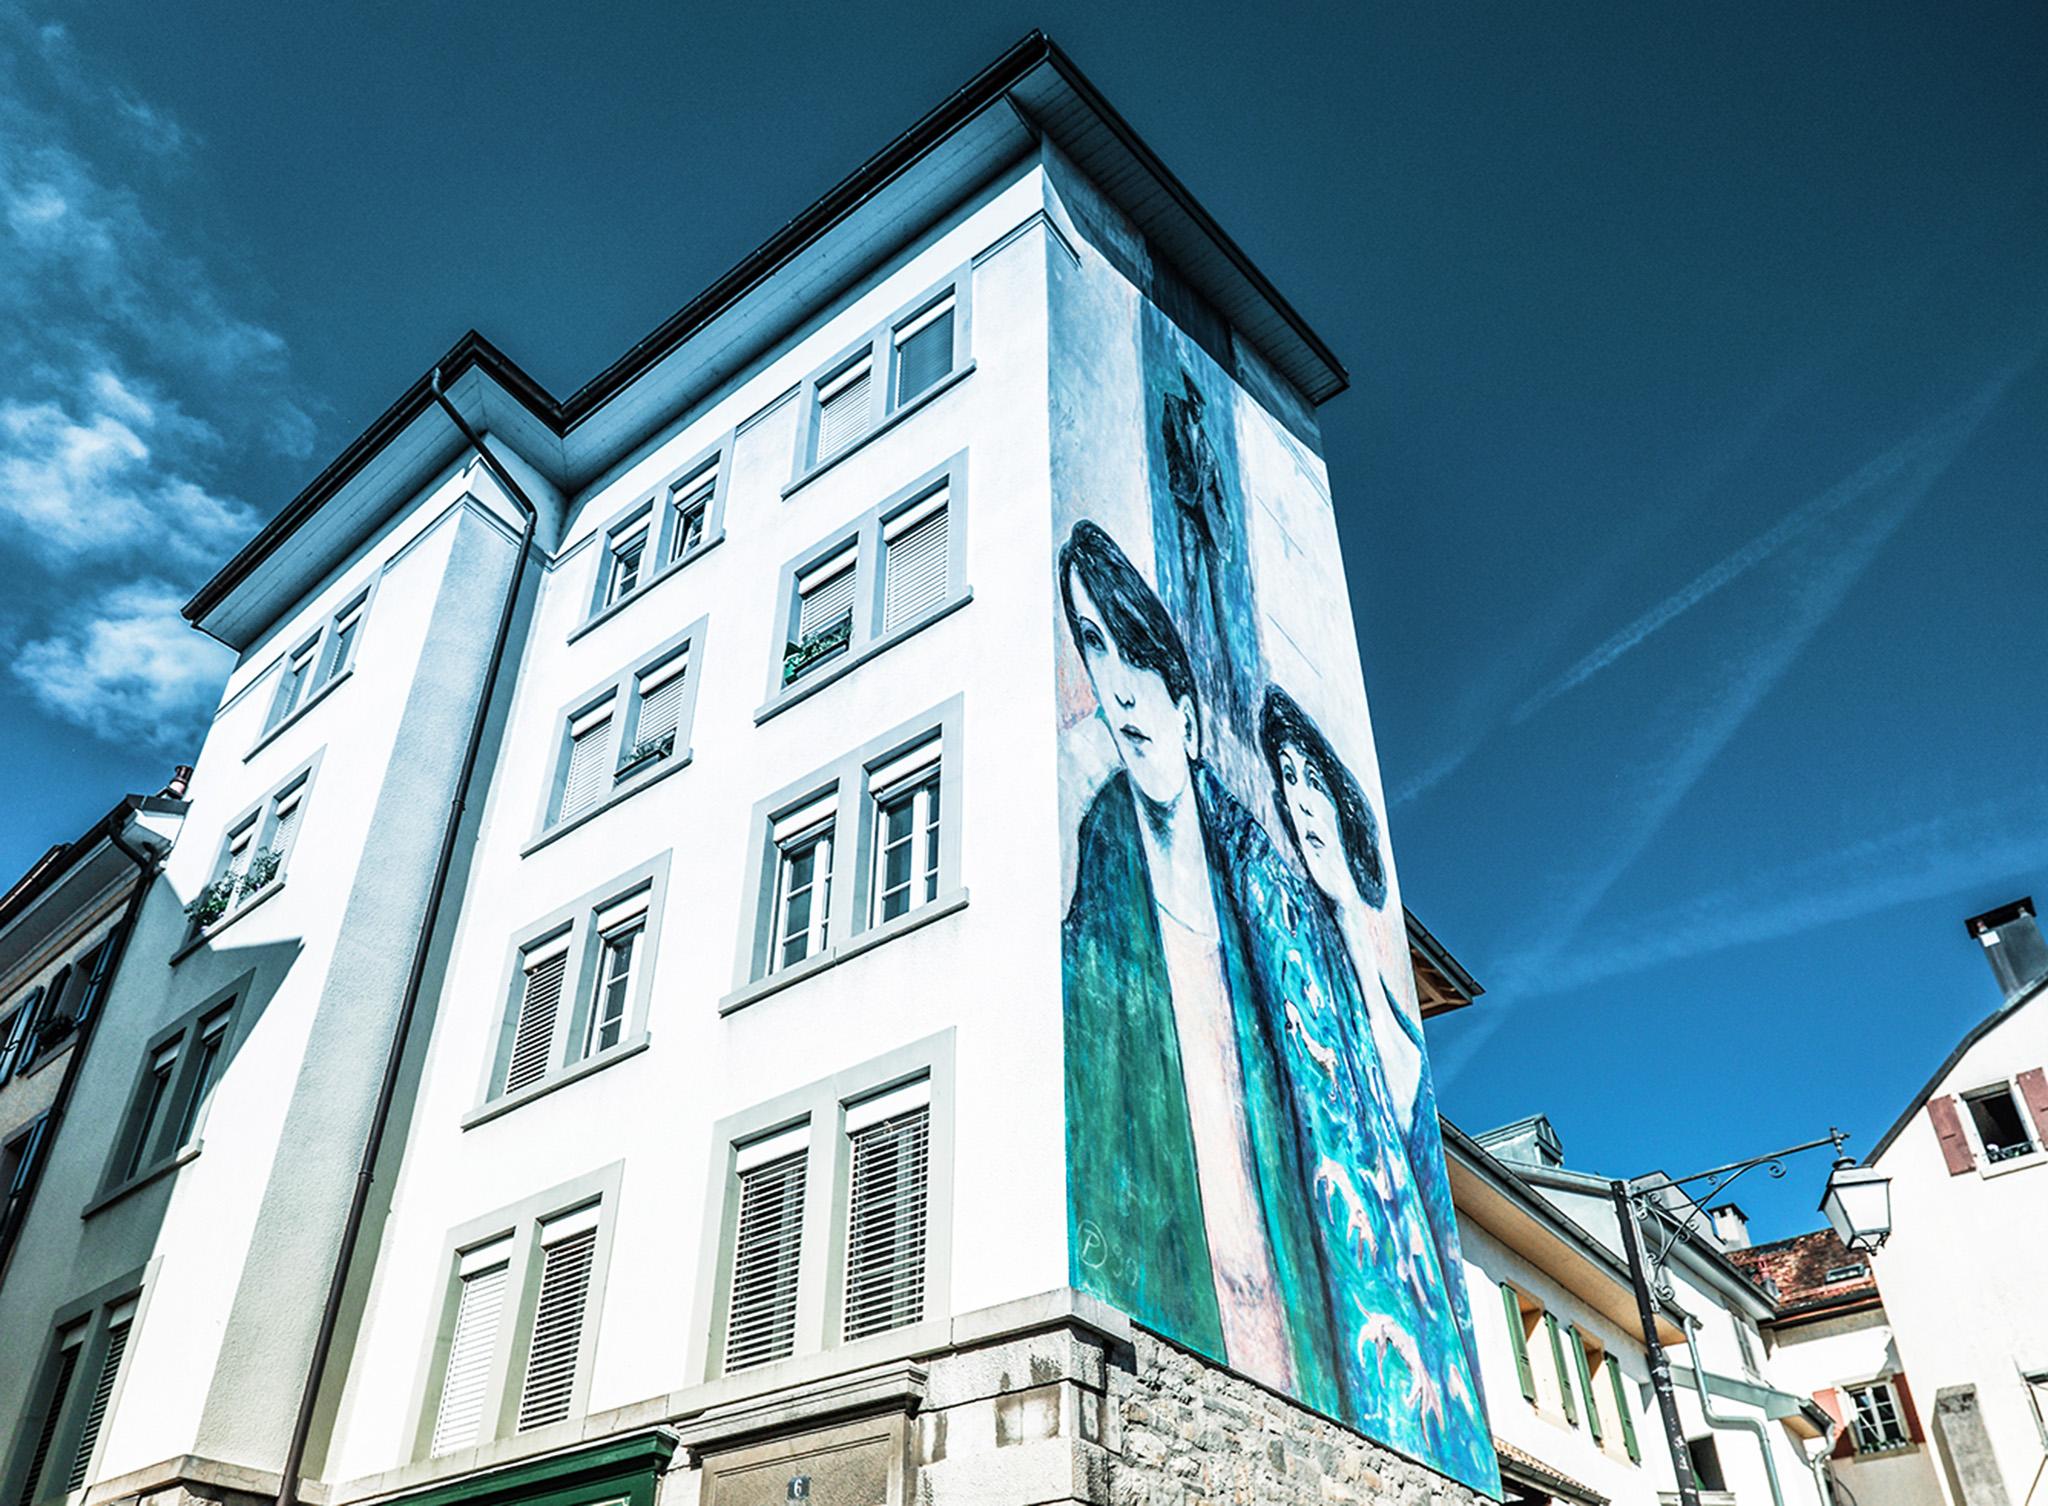 kt_2020_300_Keytours_excursions_Swisstours_vevey-city5_2048_10